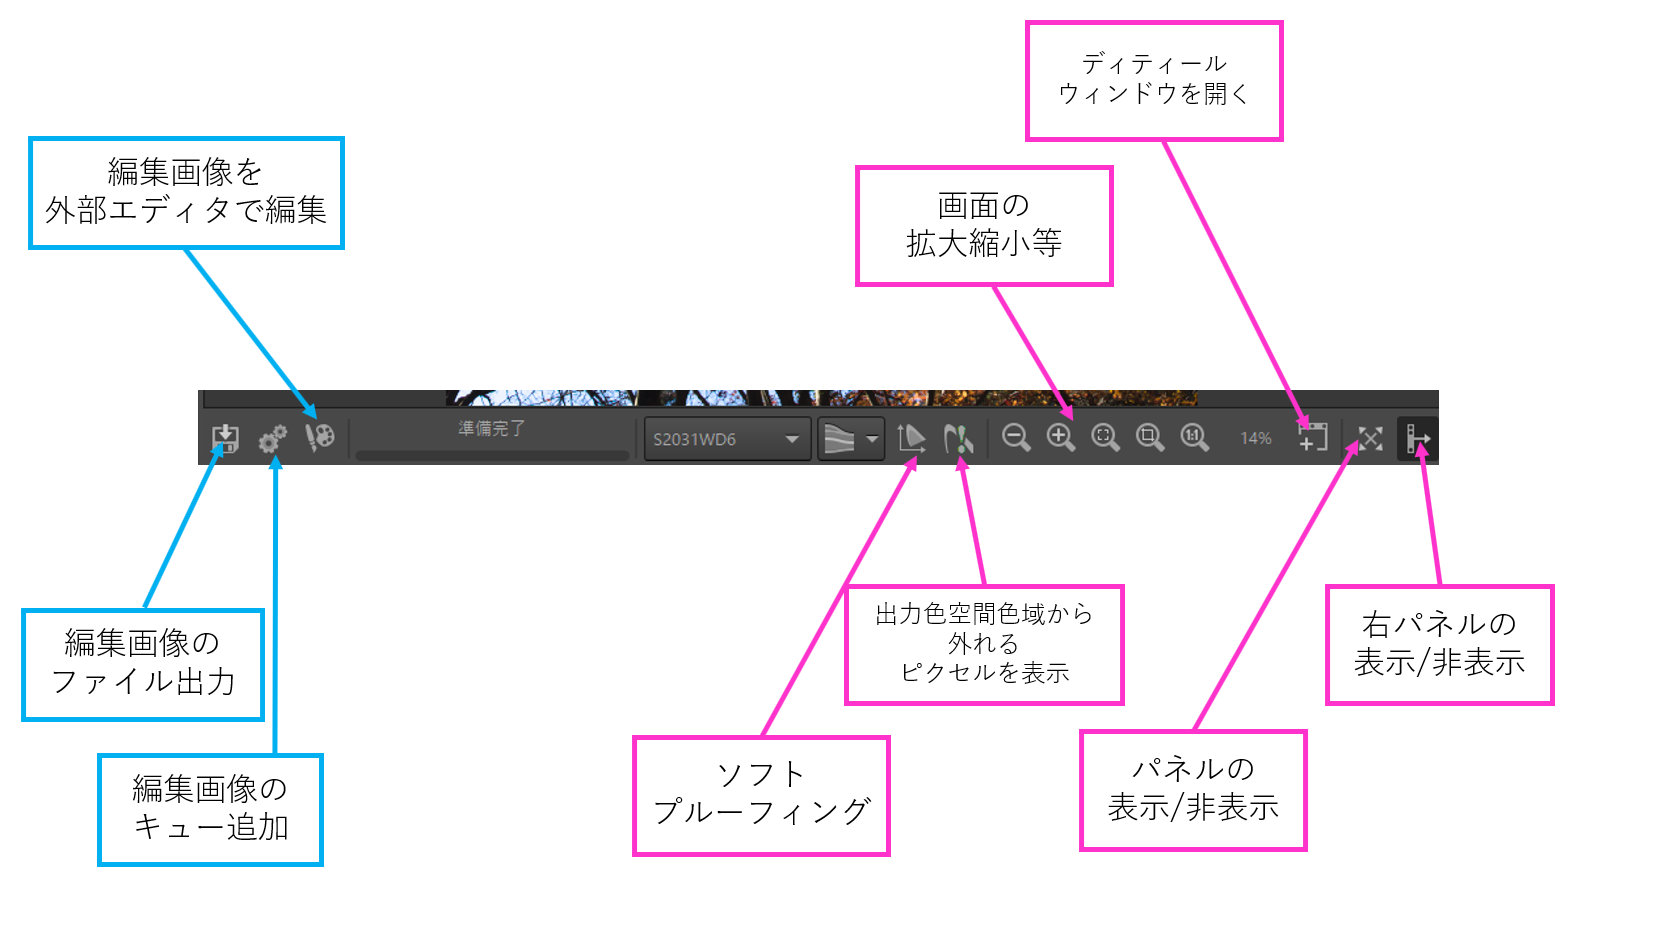 f:id:yasuo_ssi:20201206223911j:plain